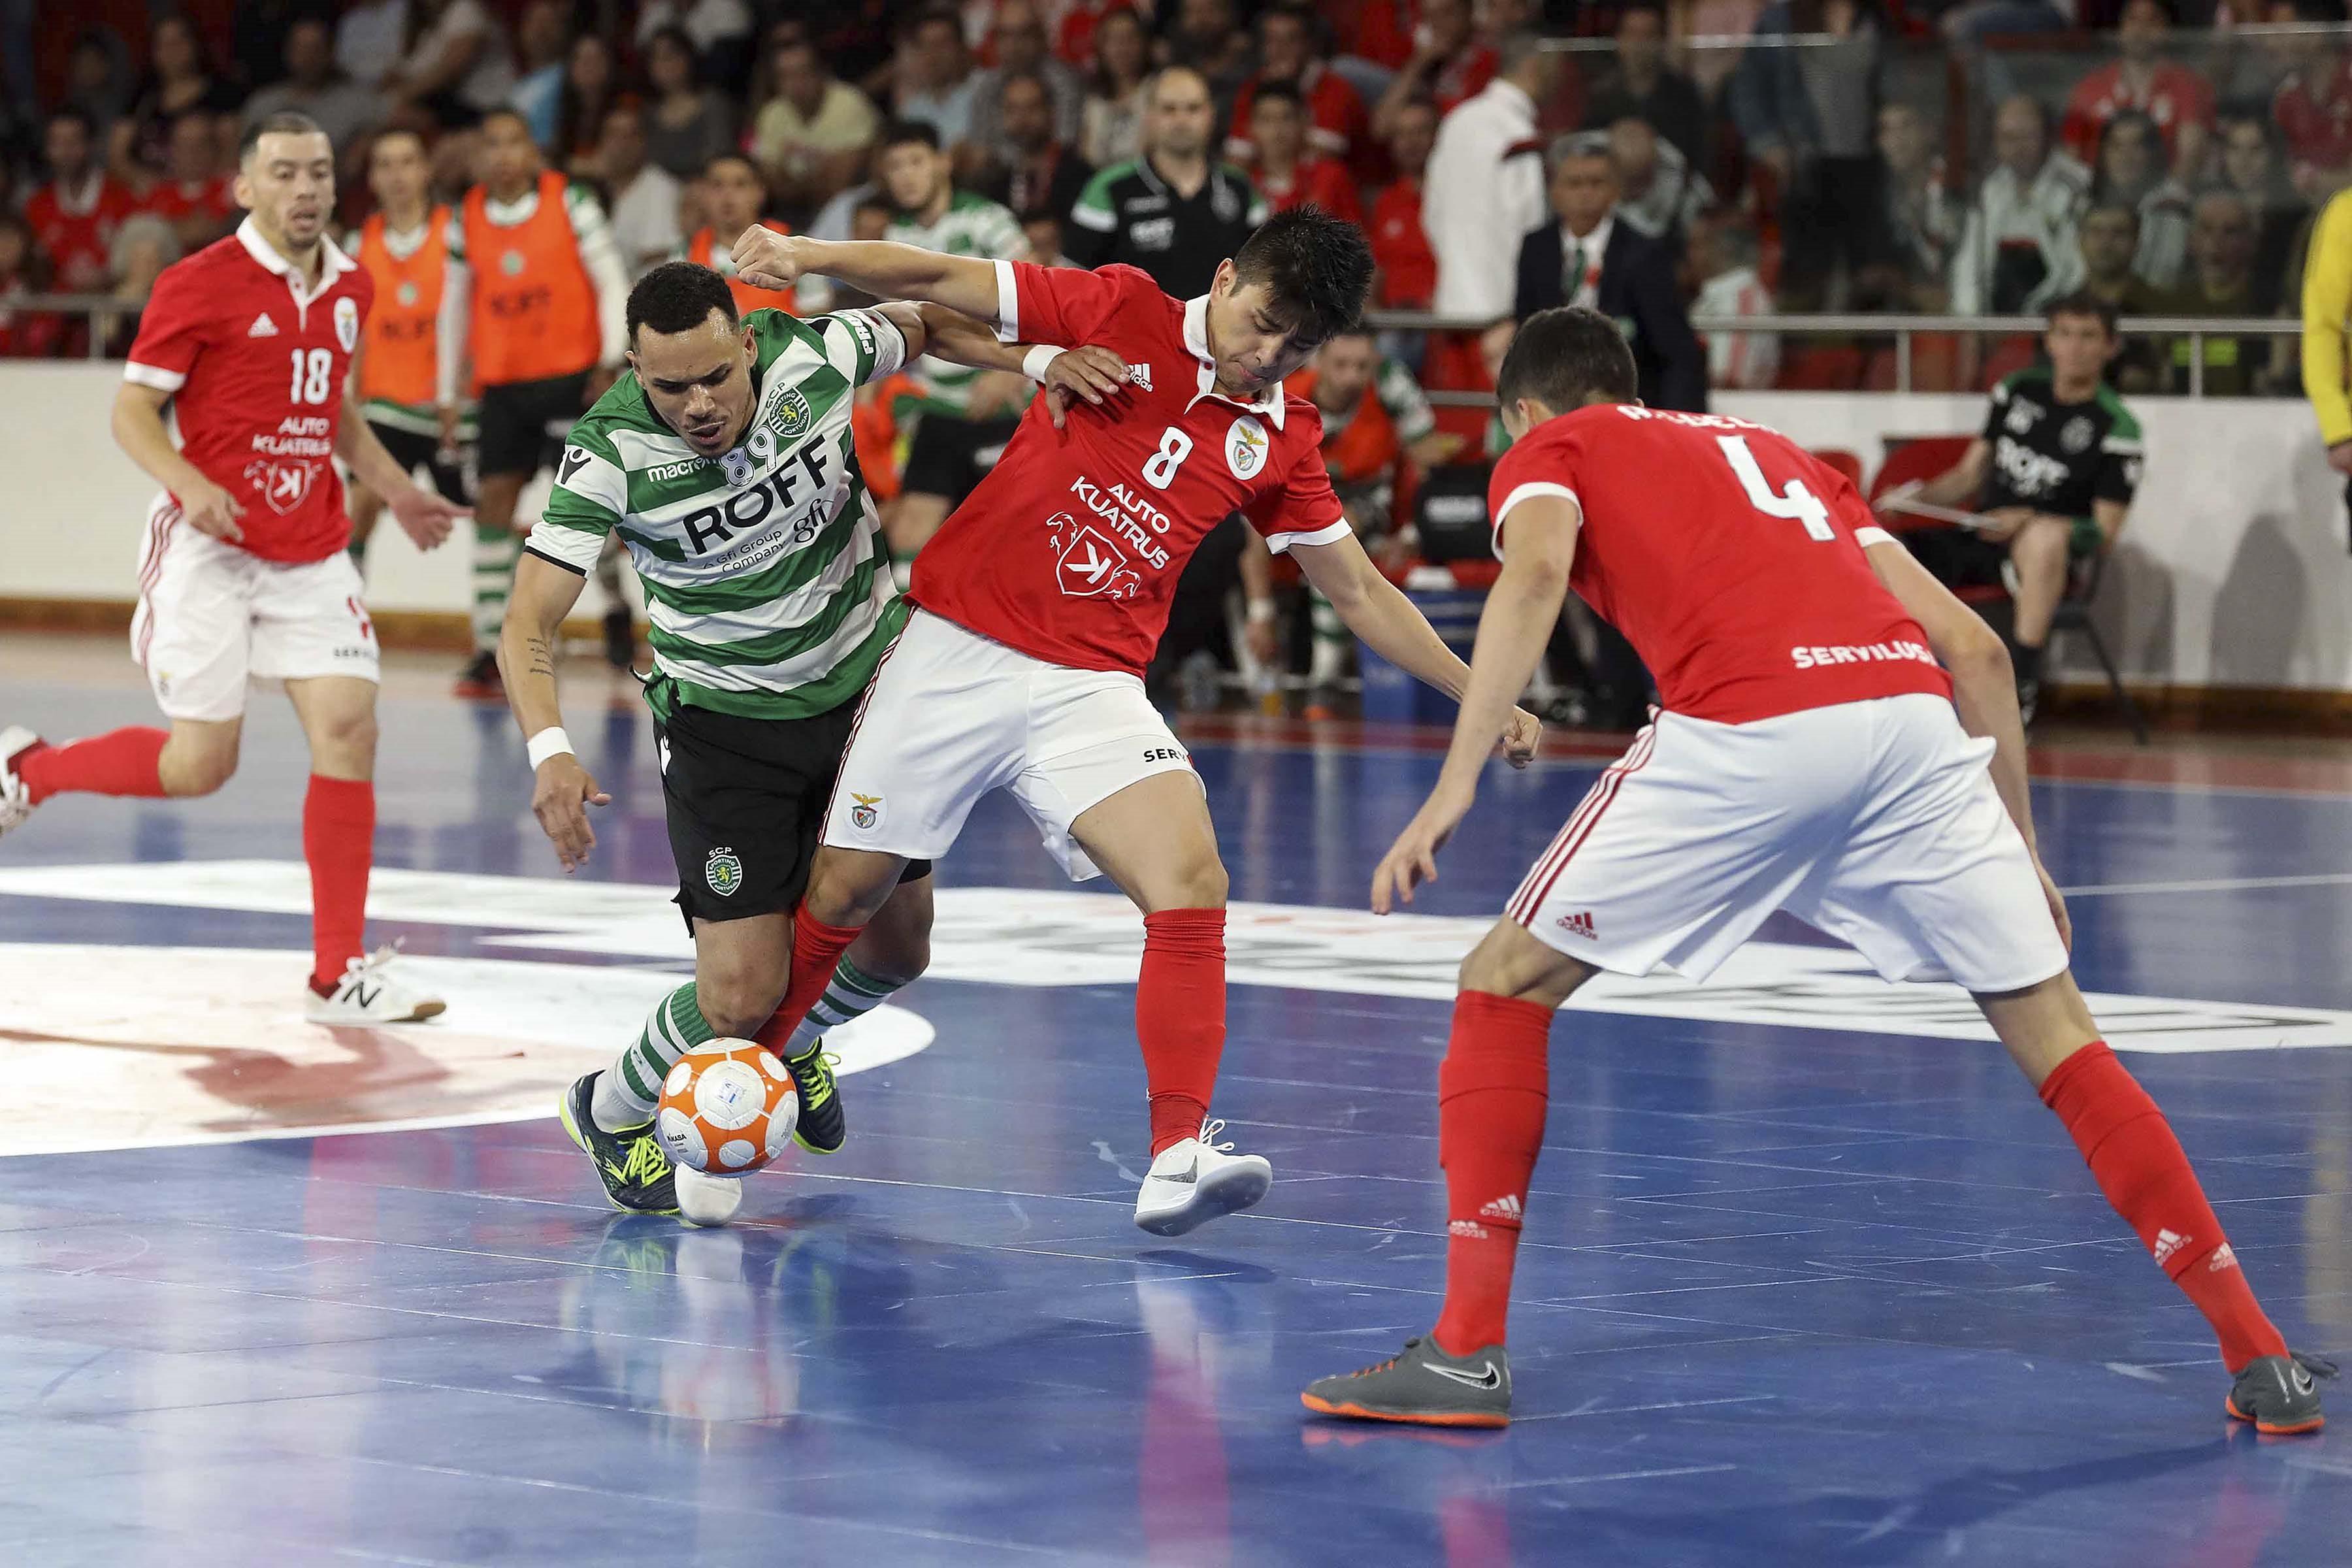 bff44dd094 Liga Sport Zone - Notícias